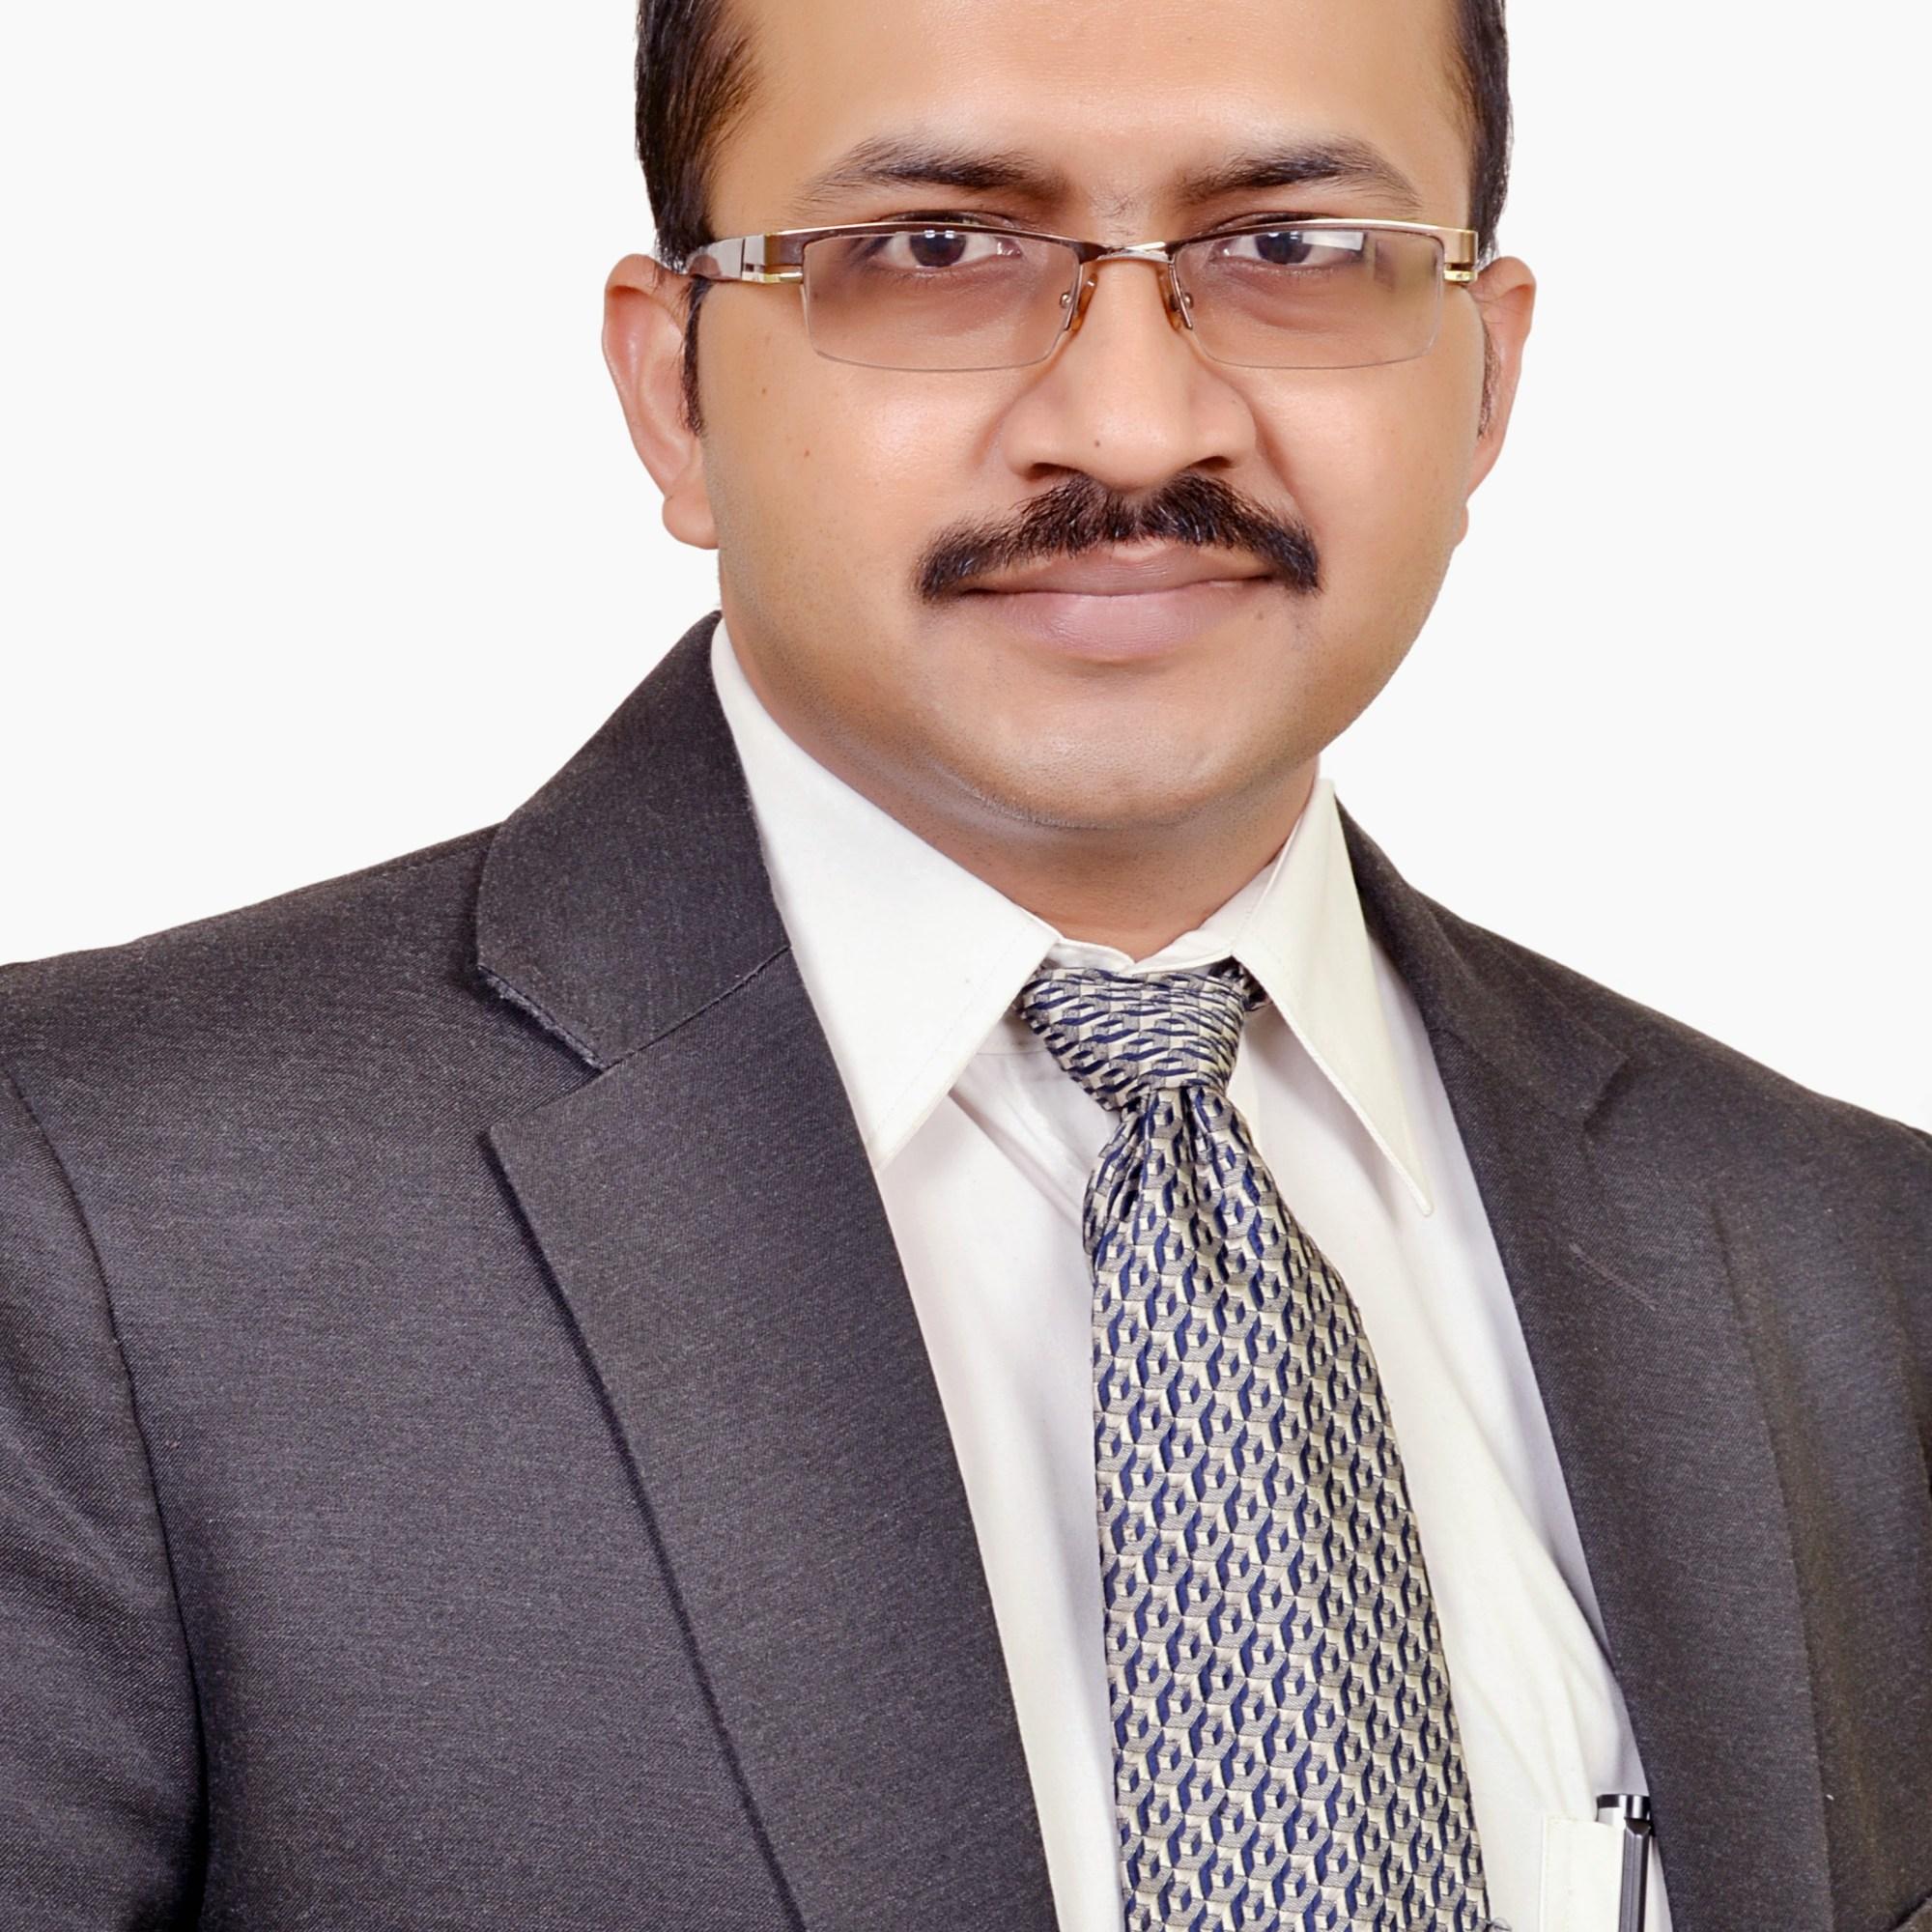 Good Laparoscopic surgeon in Noida & Delhi